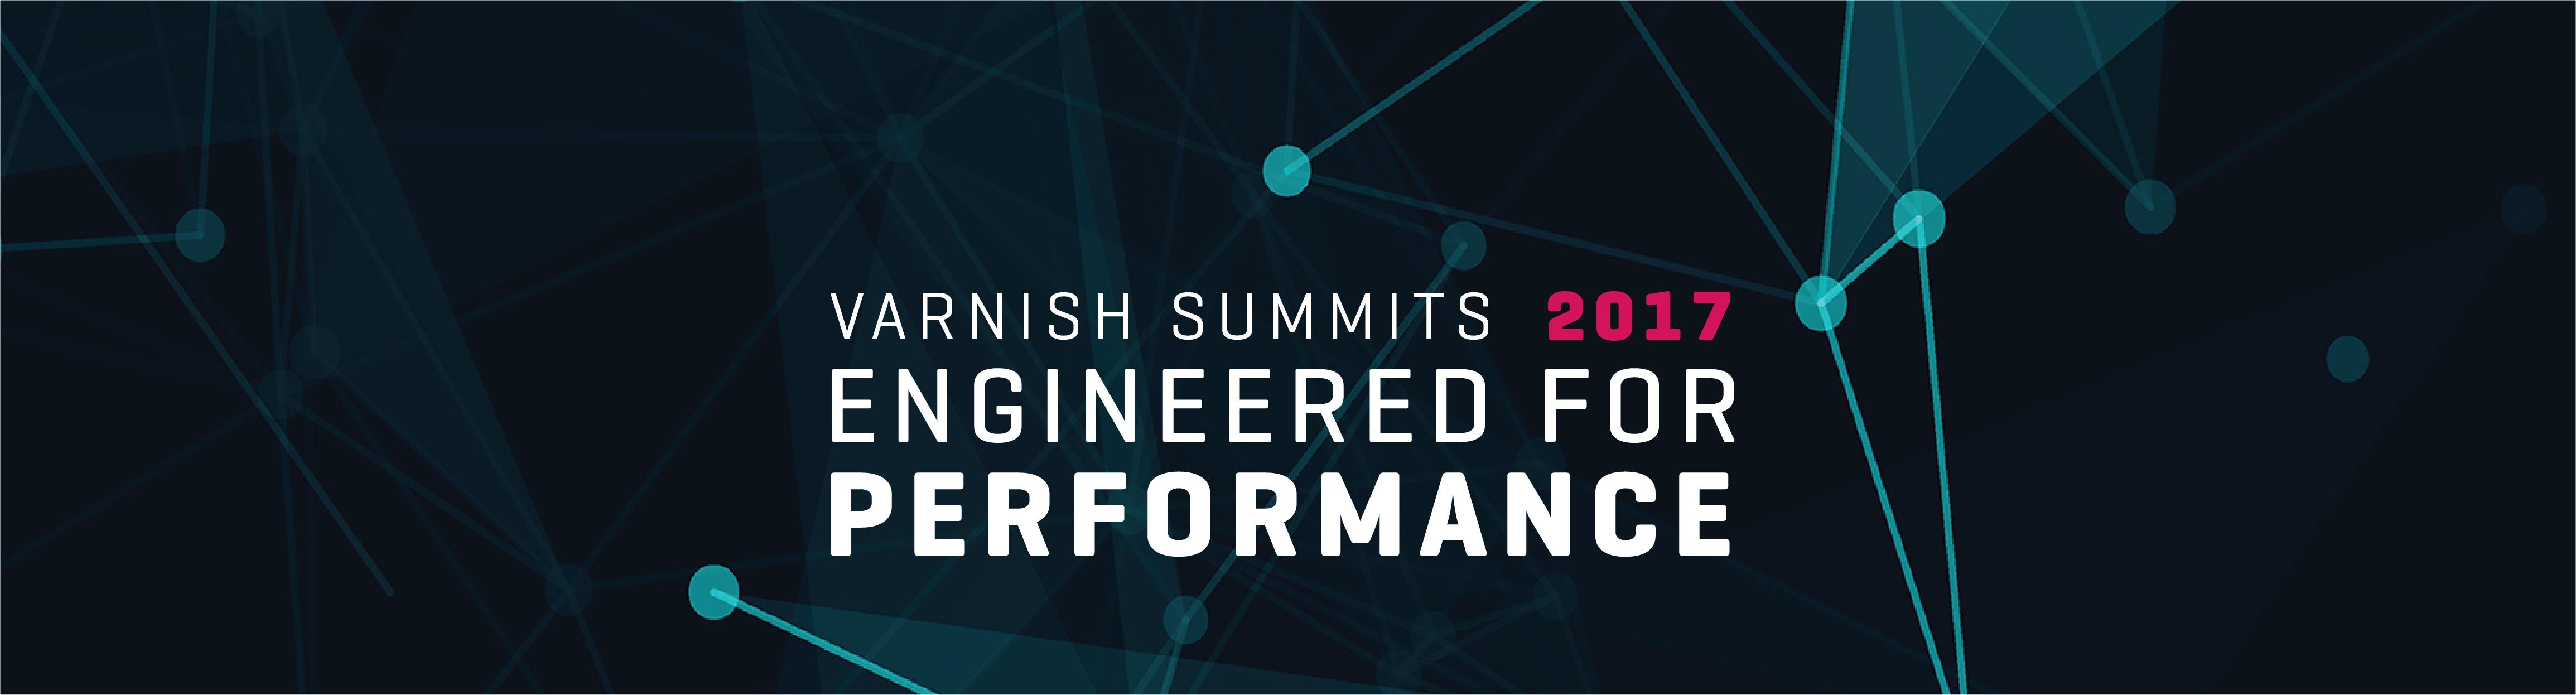 varnish summit 2017_page-02.jpg